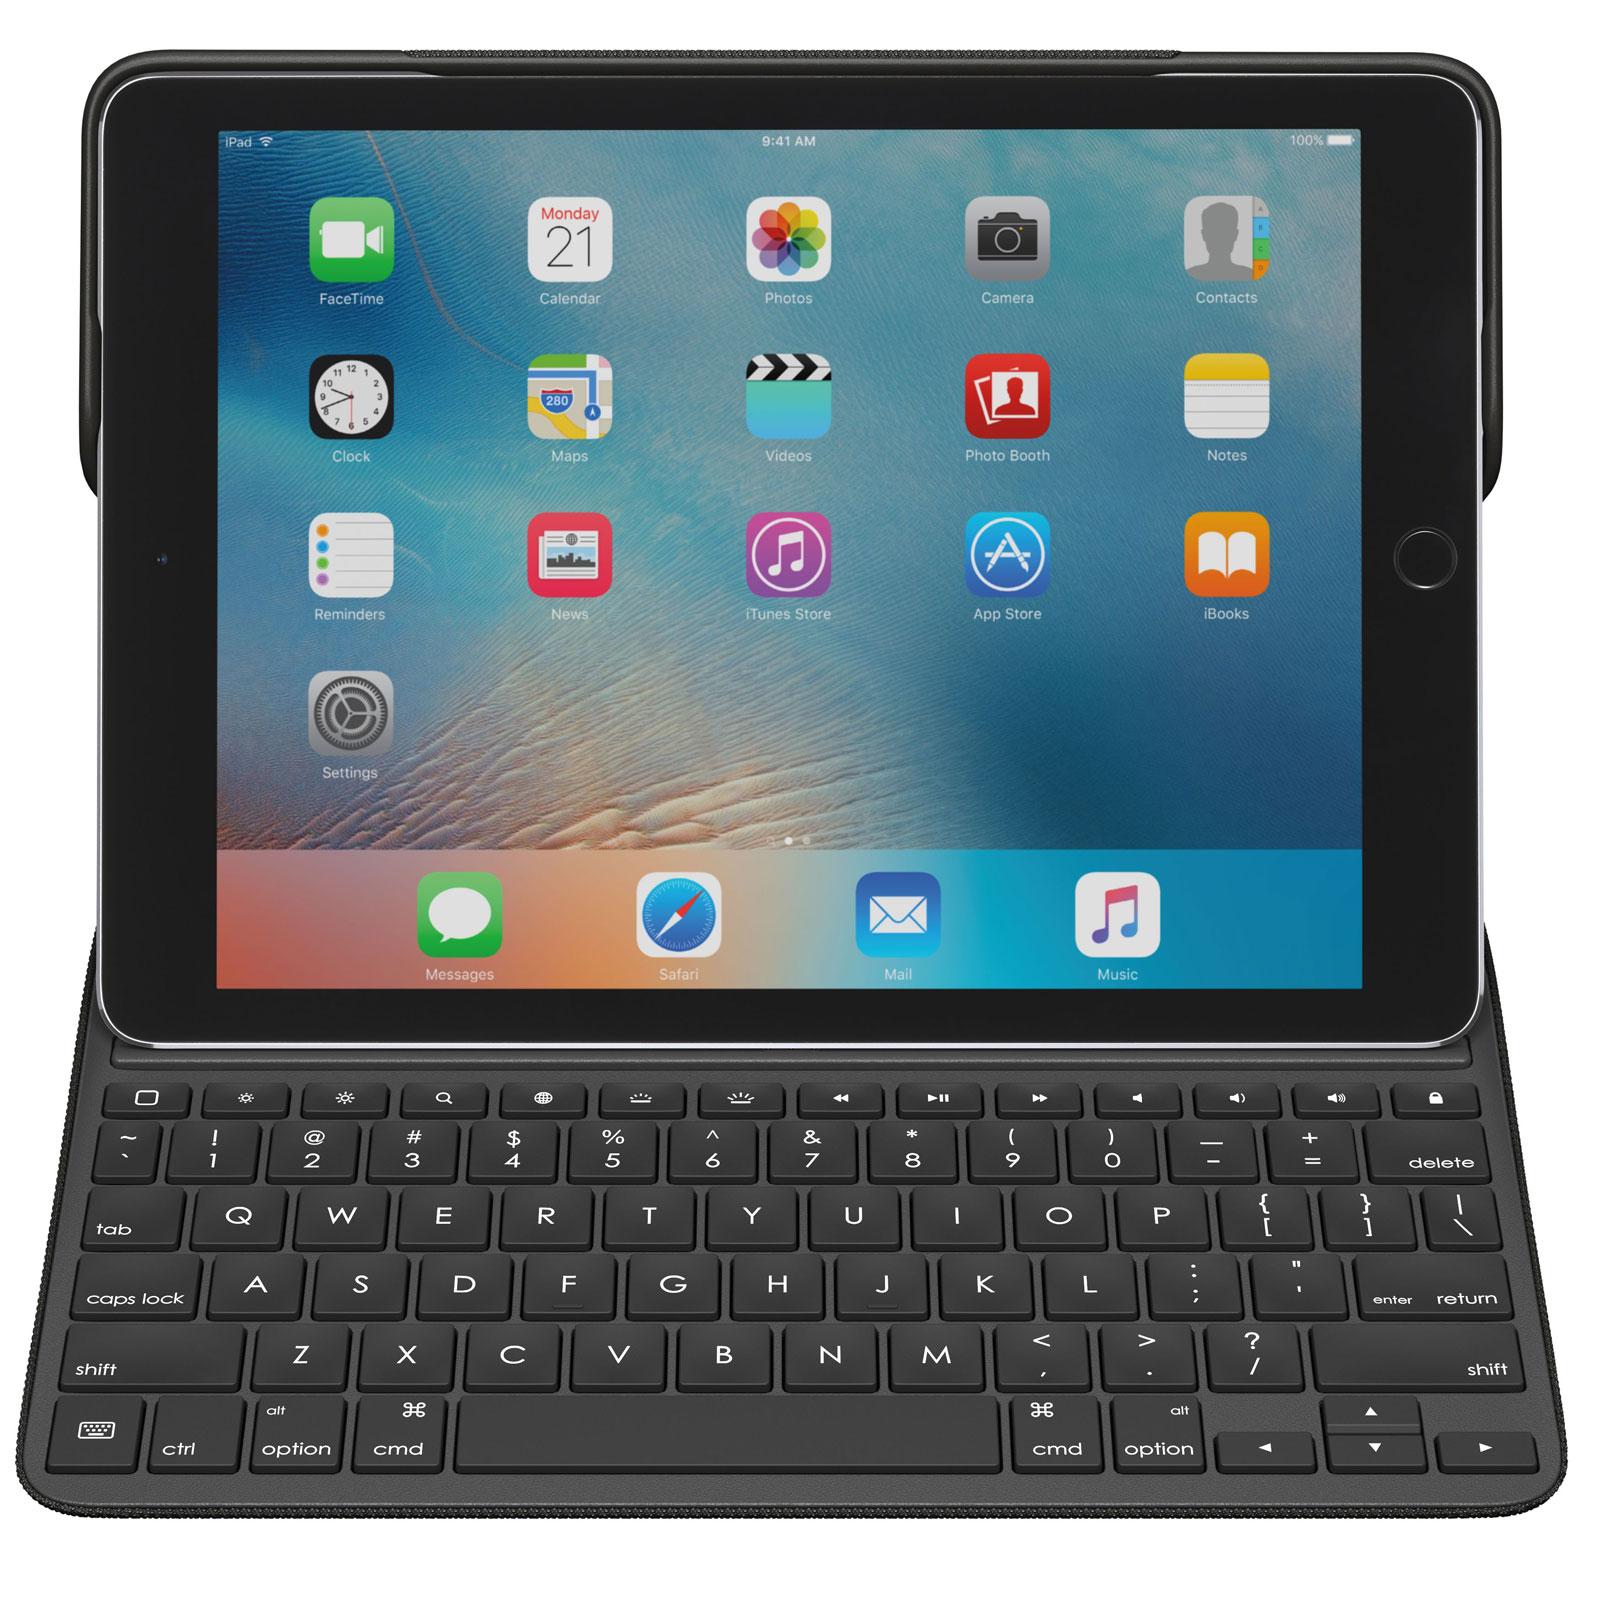 logitech create keyboard case noir ipad pro 9 7 etui tablette logitech sur. Black Bedroom Furniture Sets. Home Design Ideas